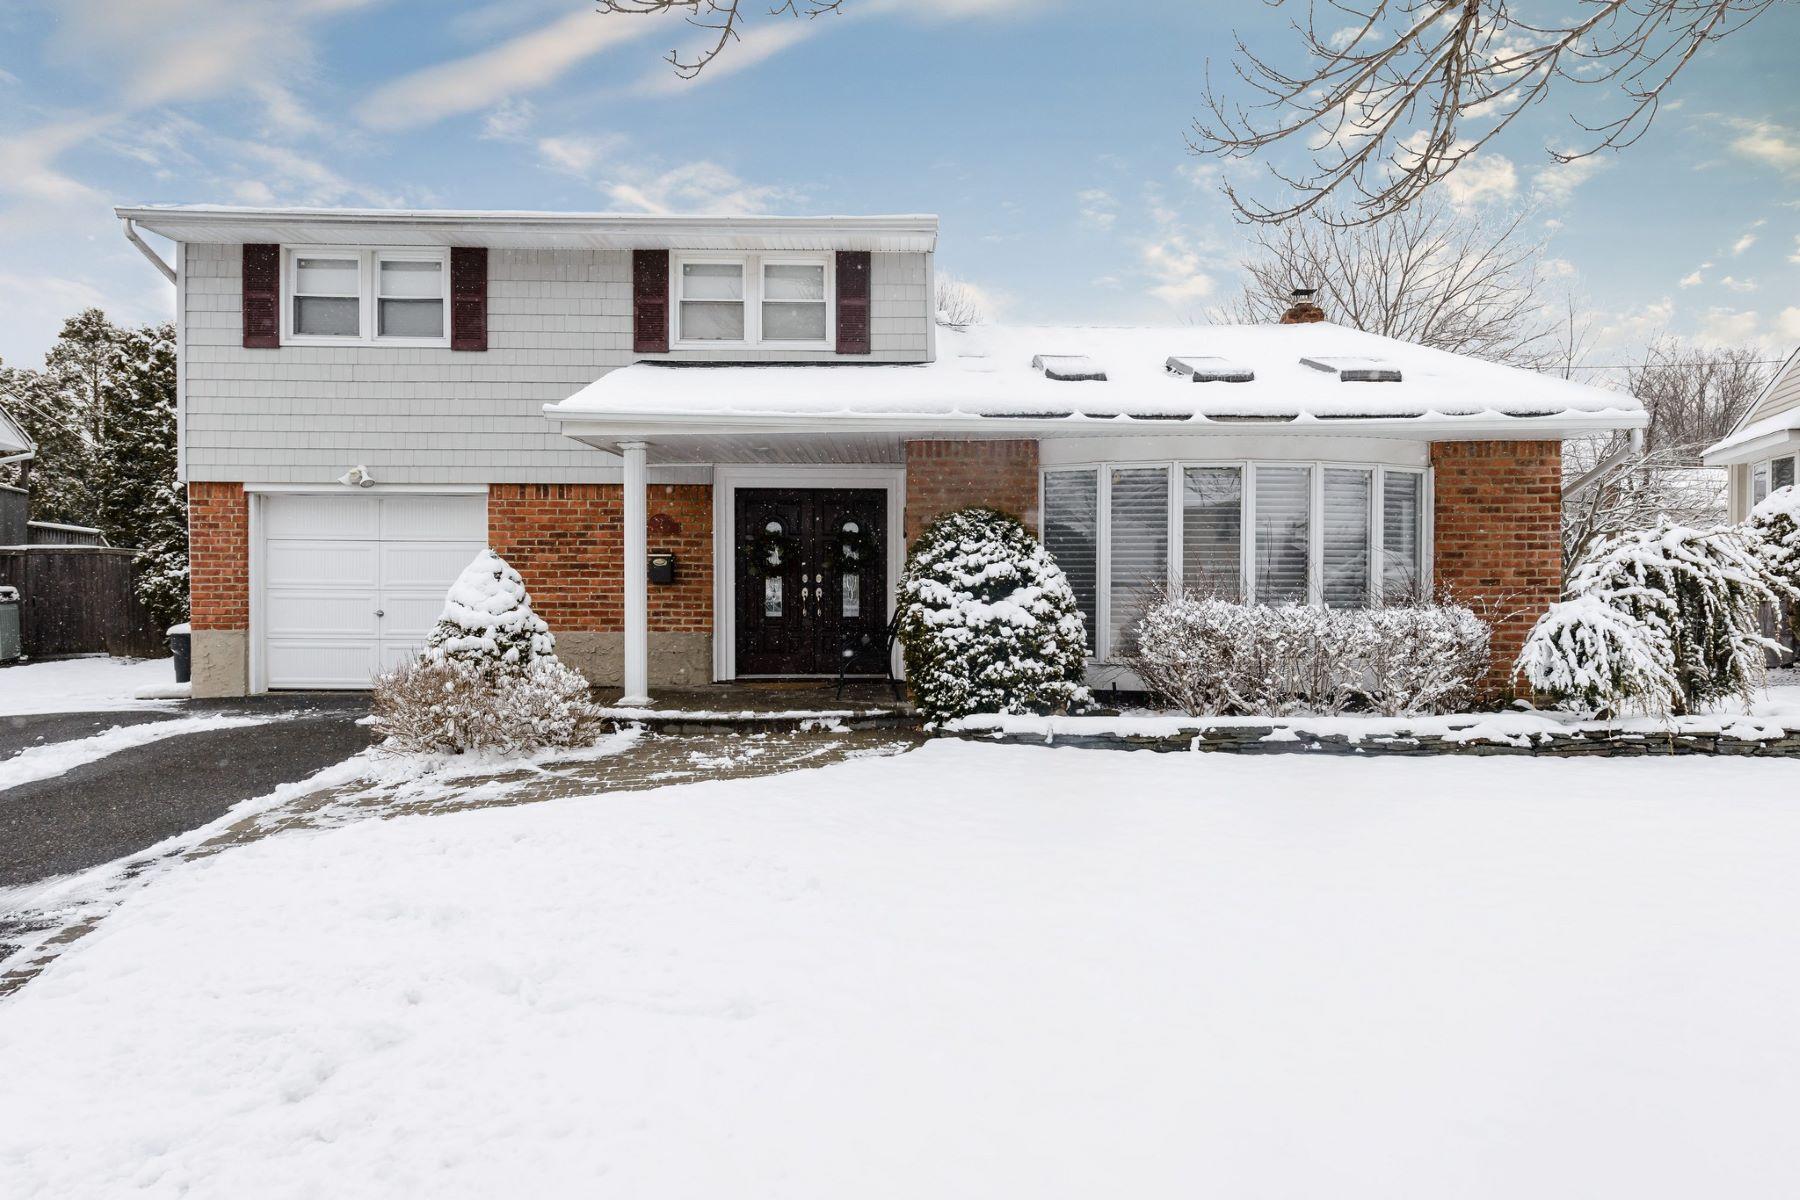 واحد منزل الأسرة للـ Sale في 7 Rita Ln , Plainview, NY 11803 7 Rita Ln, Plainview, New York, 11803 United States